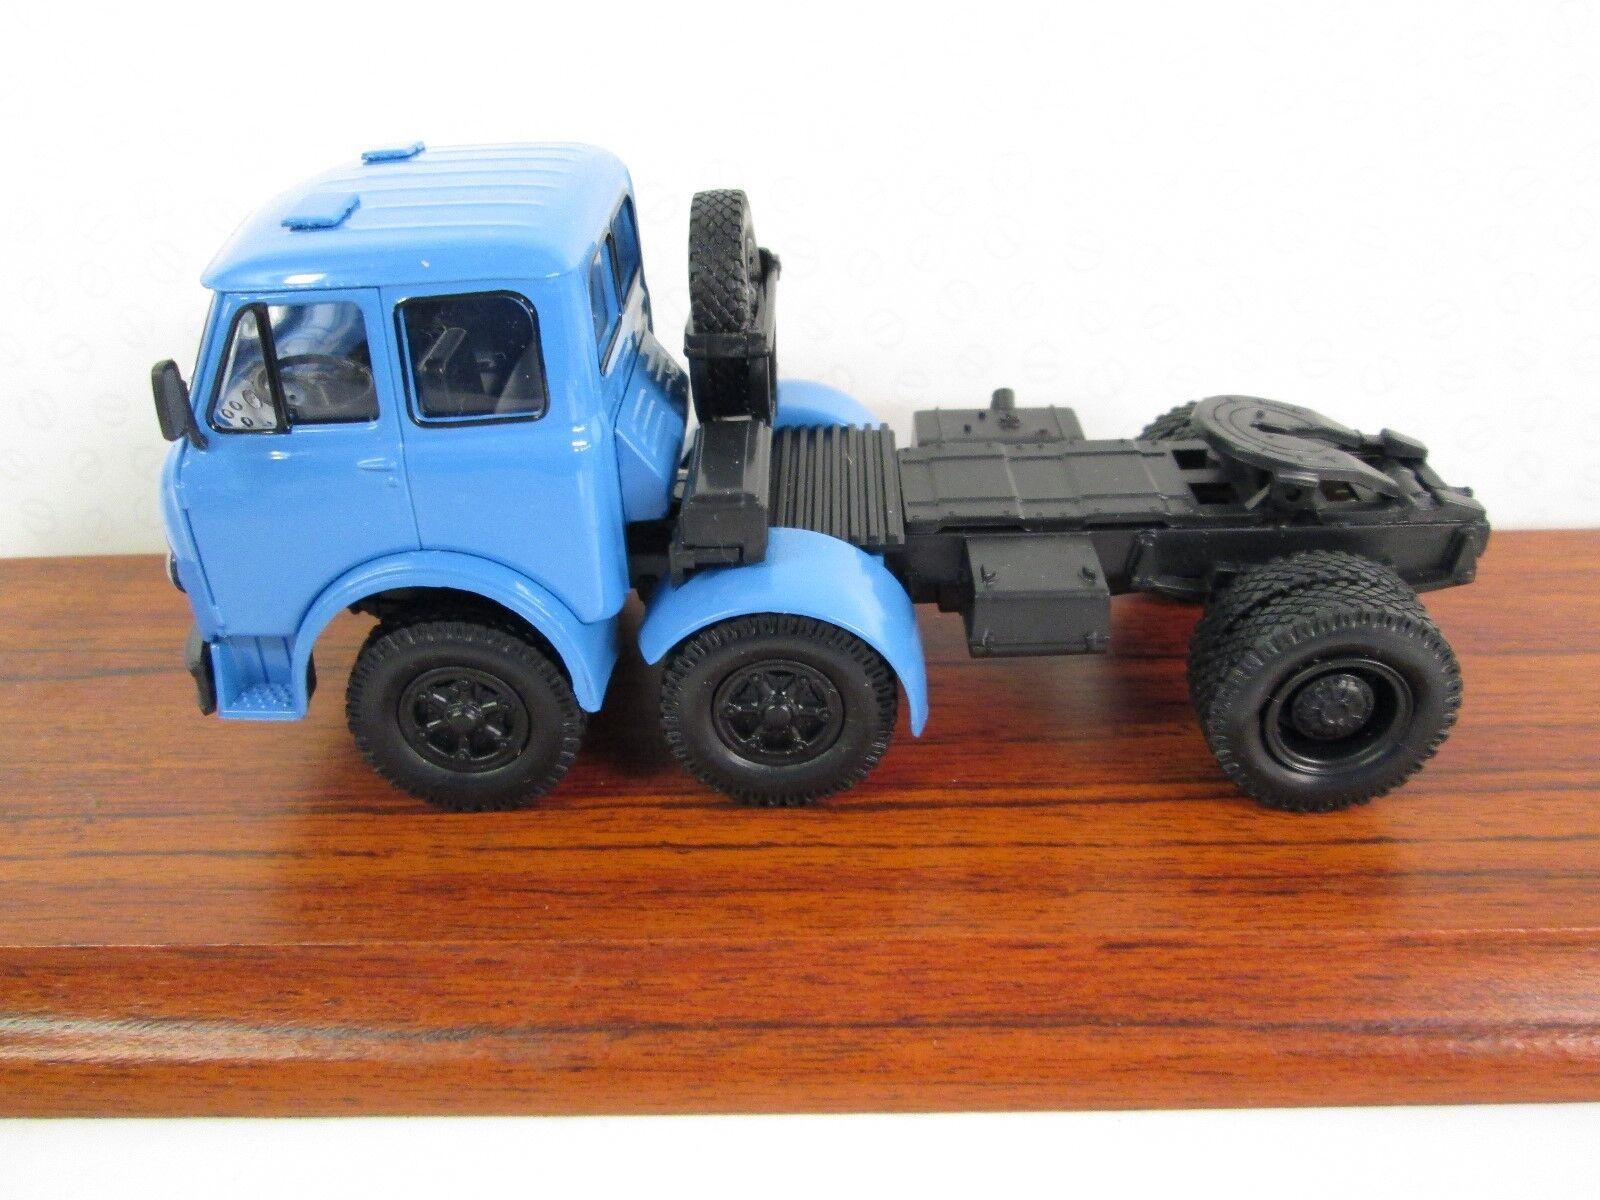 KrAZ. MAZ 520 Tractor Unit. Special C-81.1 43. Blau. SPC220610